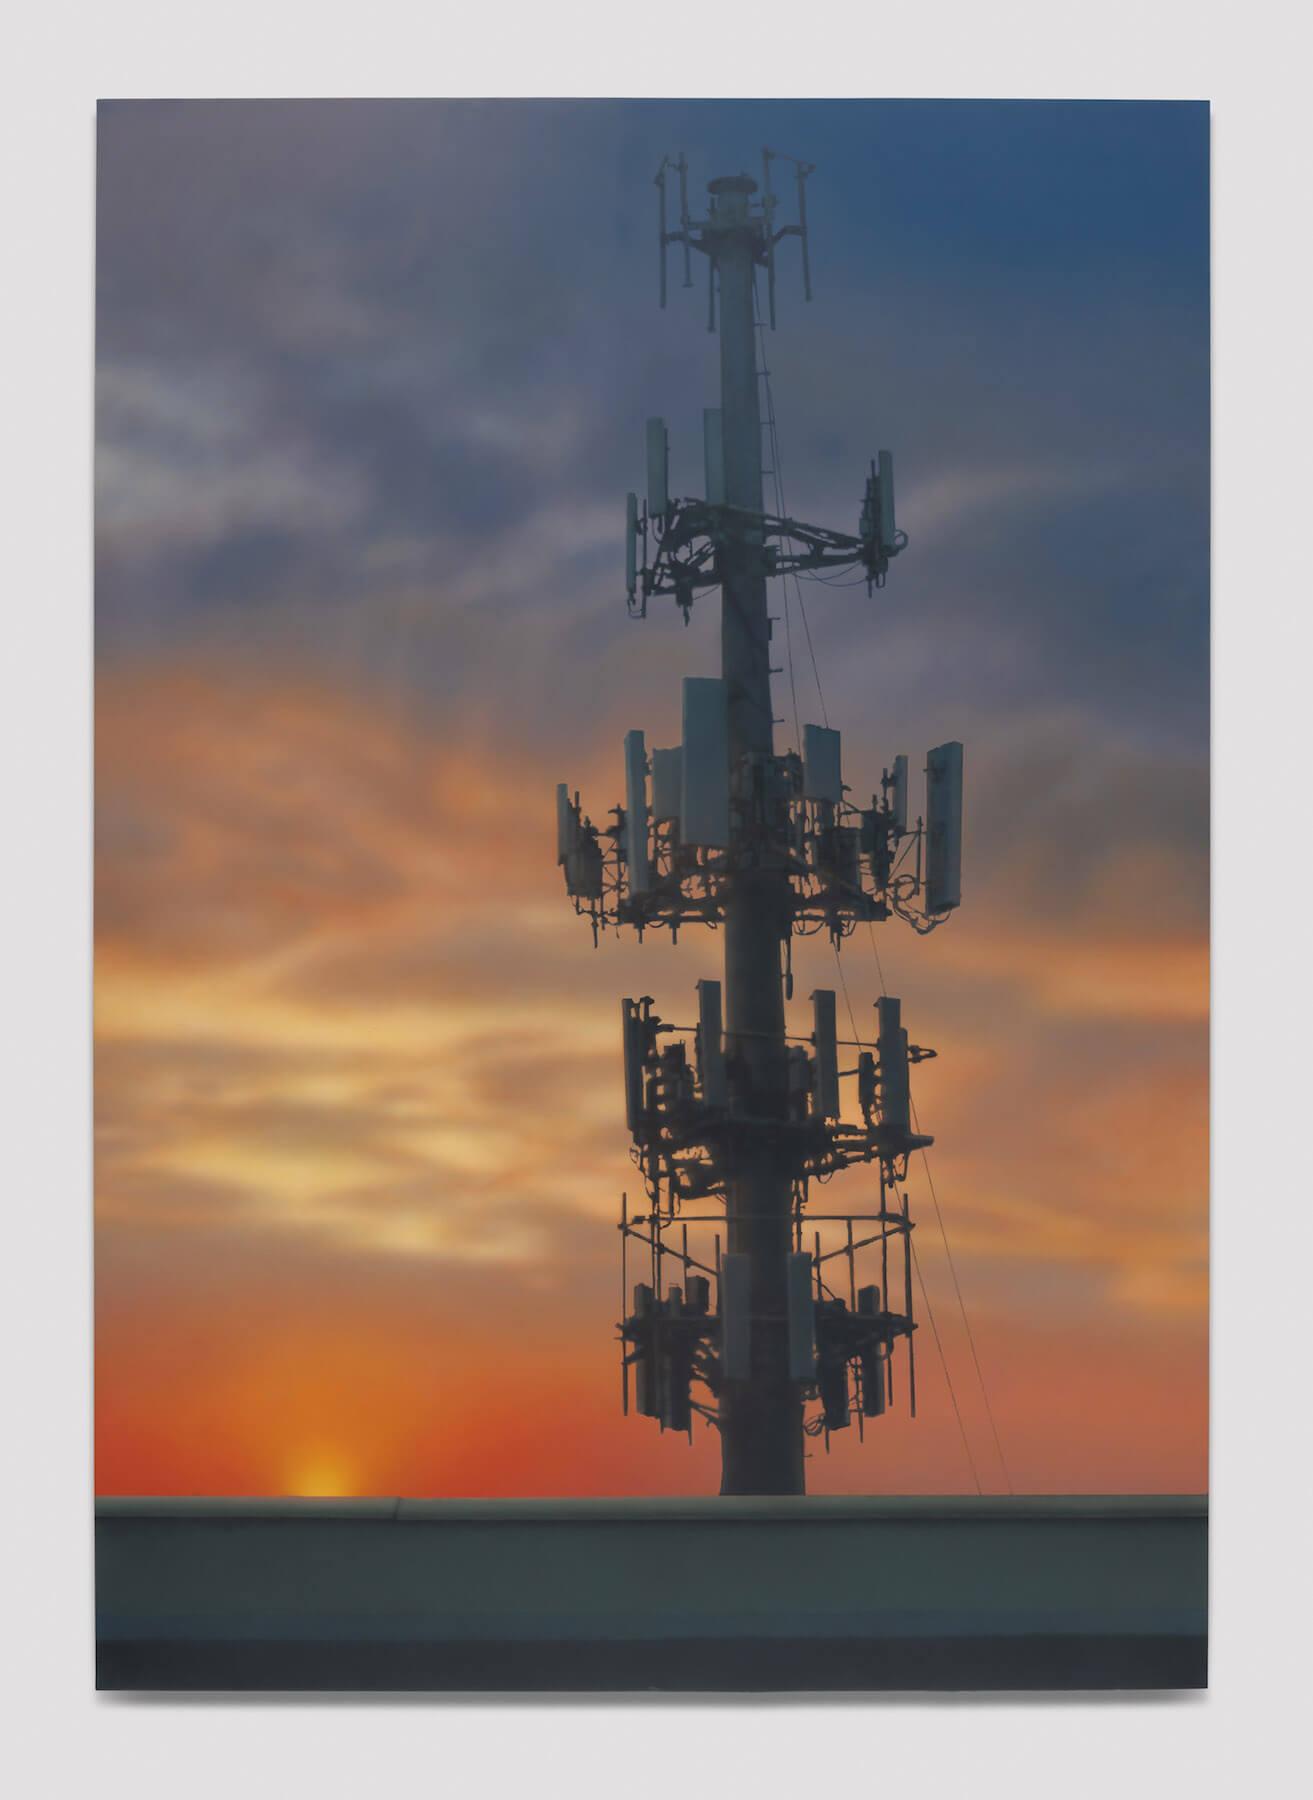 Gomez, Tower, 2019 (SG 19.014)